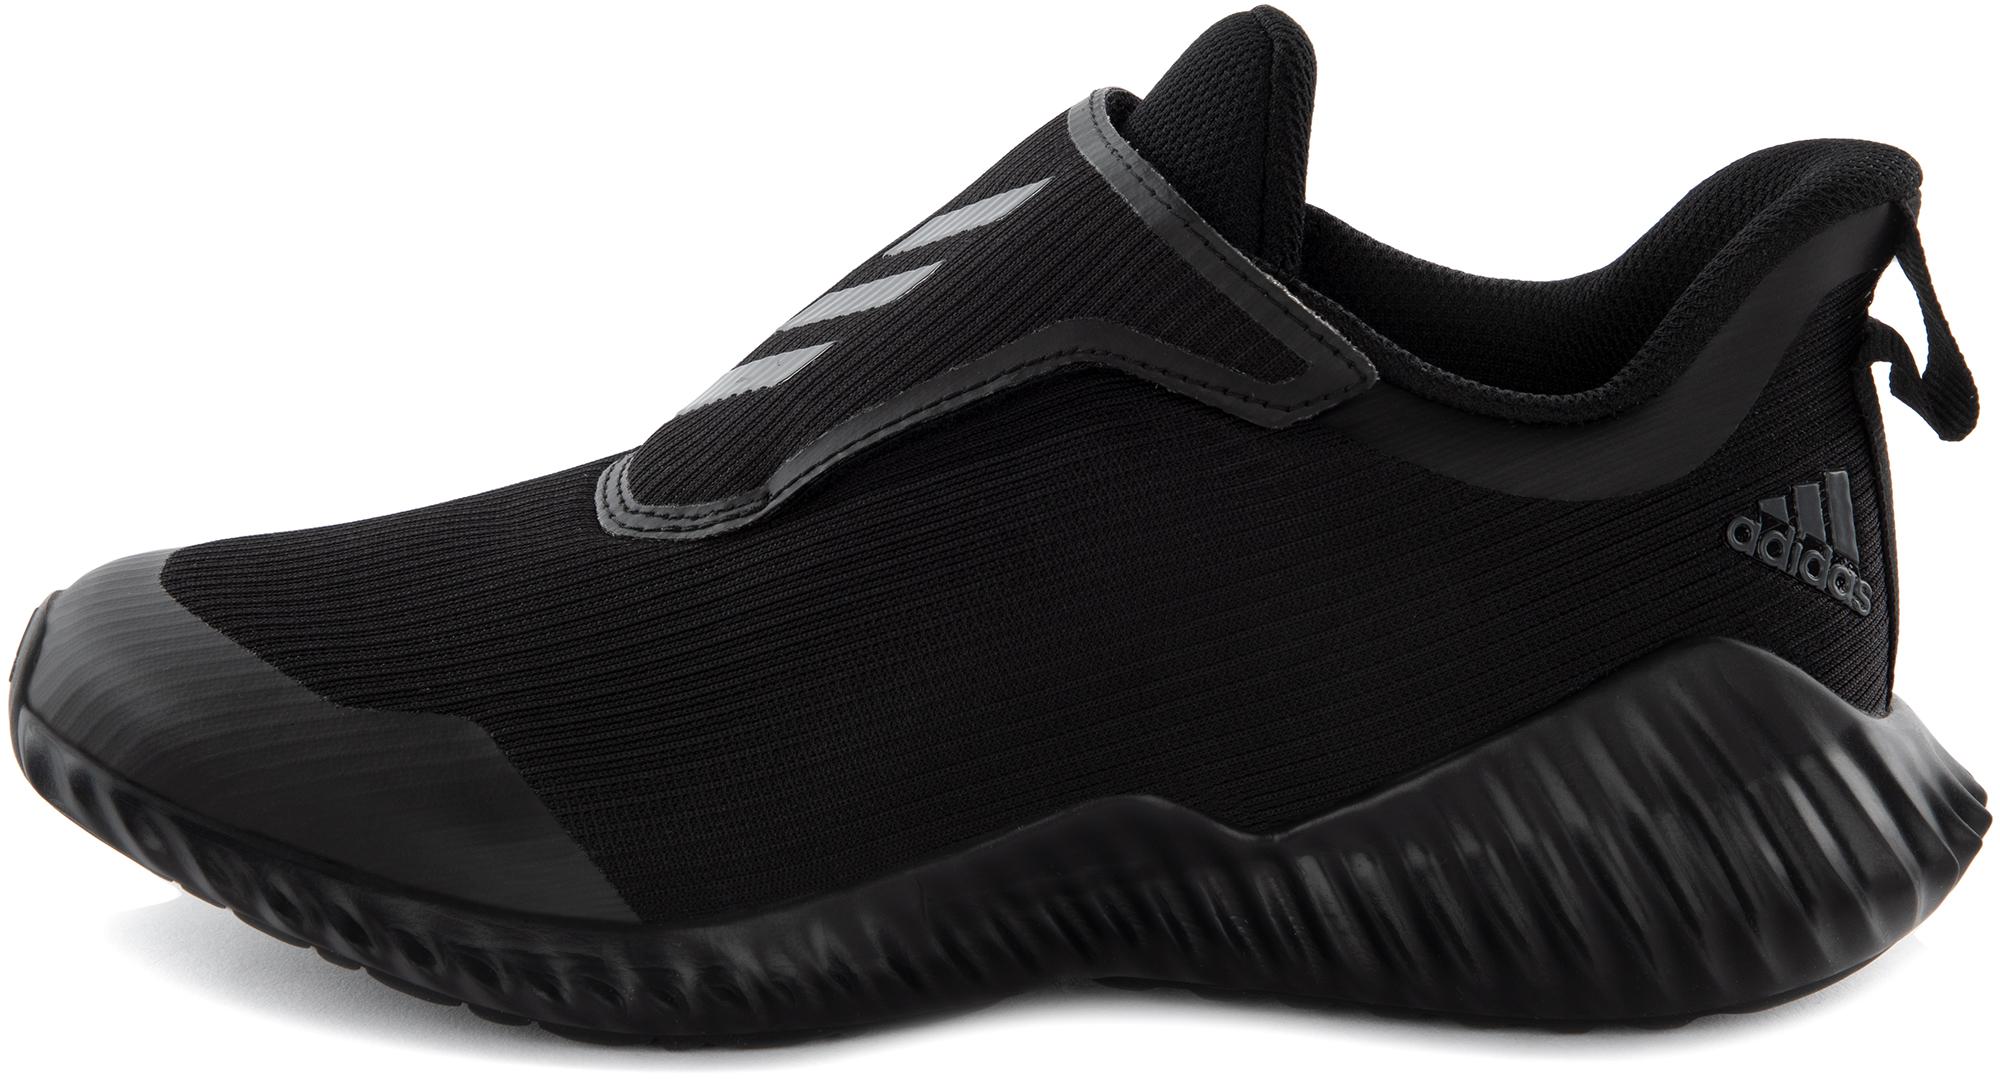 Adidas Кроссовки детские Adidas FortaRun, размер 38,5 кроссовки adidas zx flux ild47